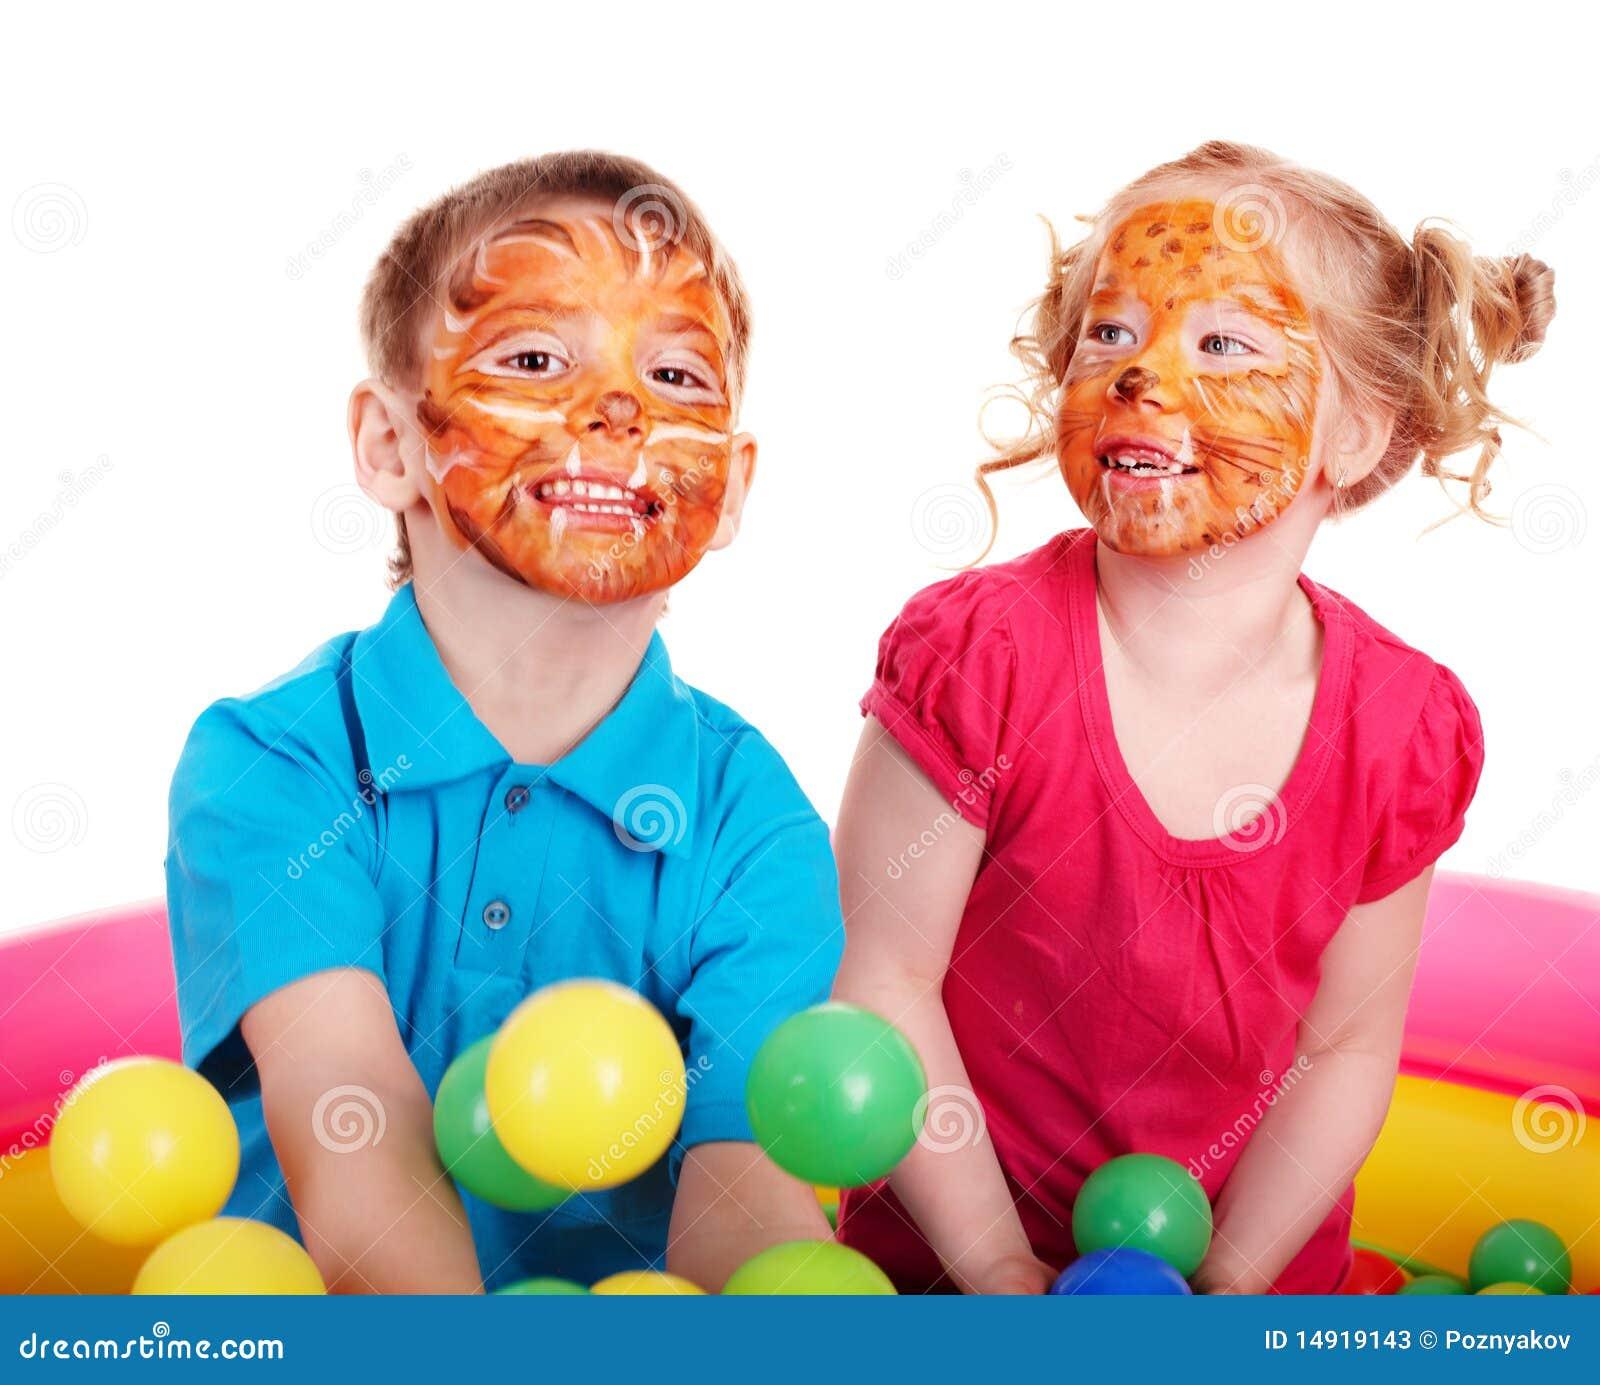 enfants avec la peinture de visage image stock image du people bonheur 14919143. Black Bedroom Furniture Sets. Home Design Ideas